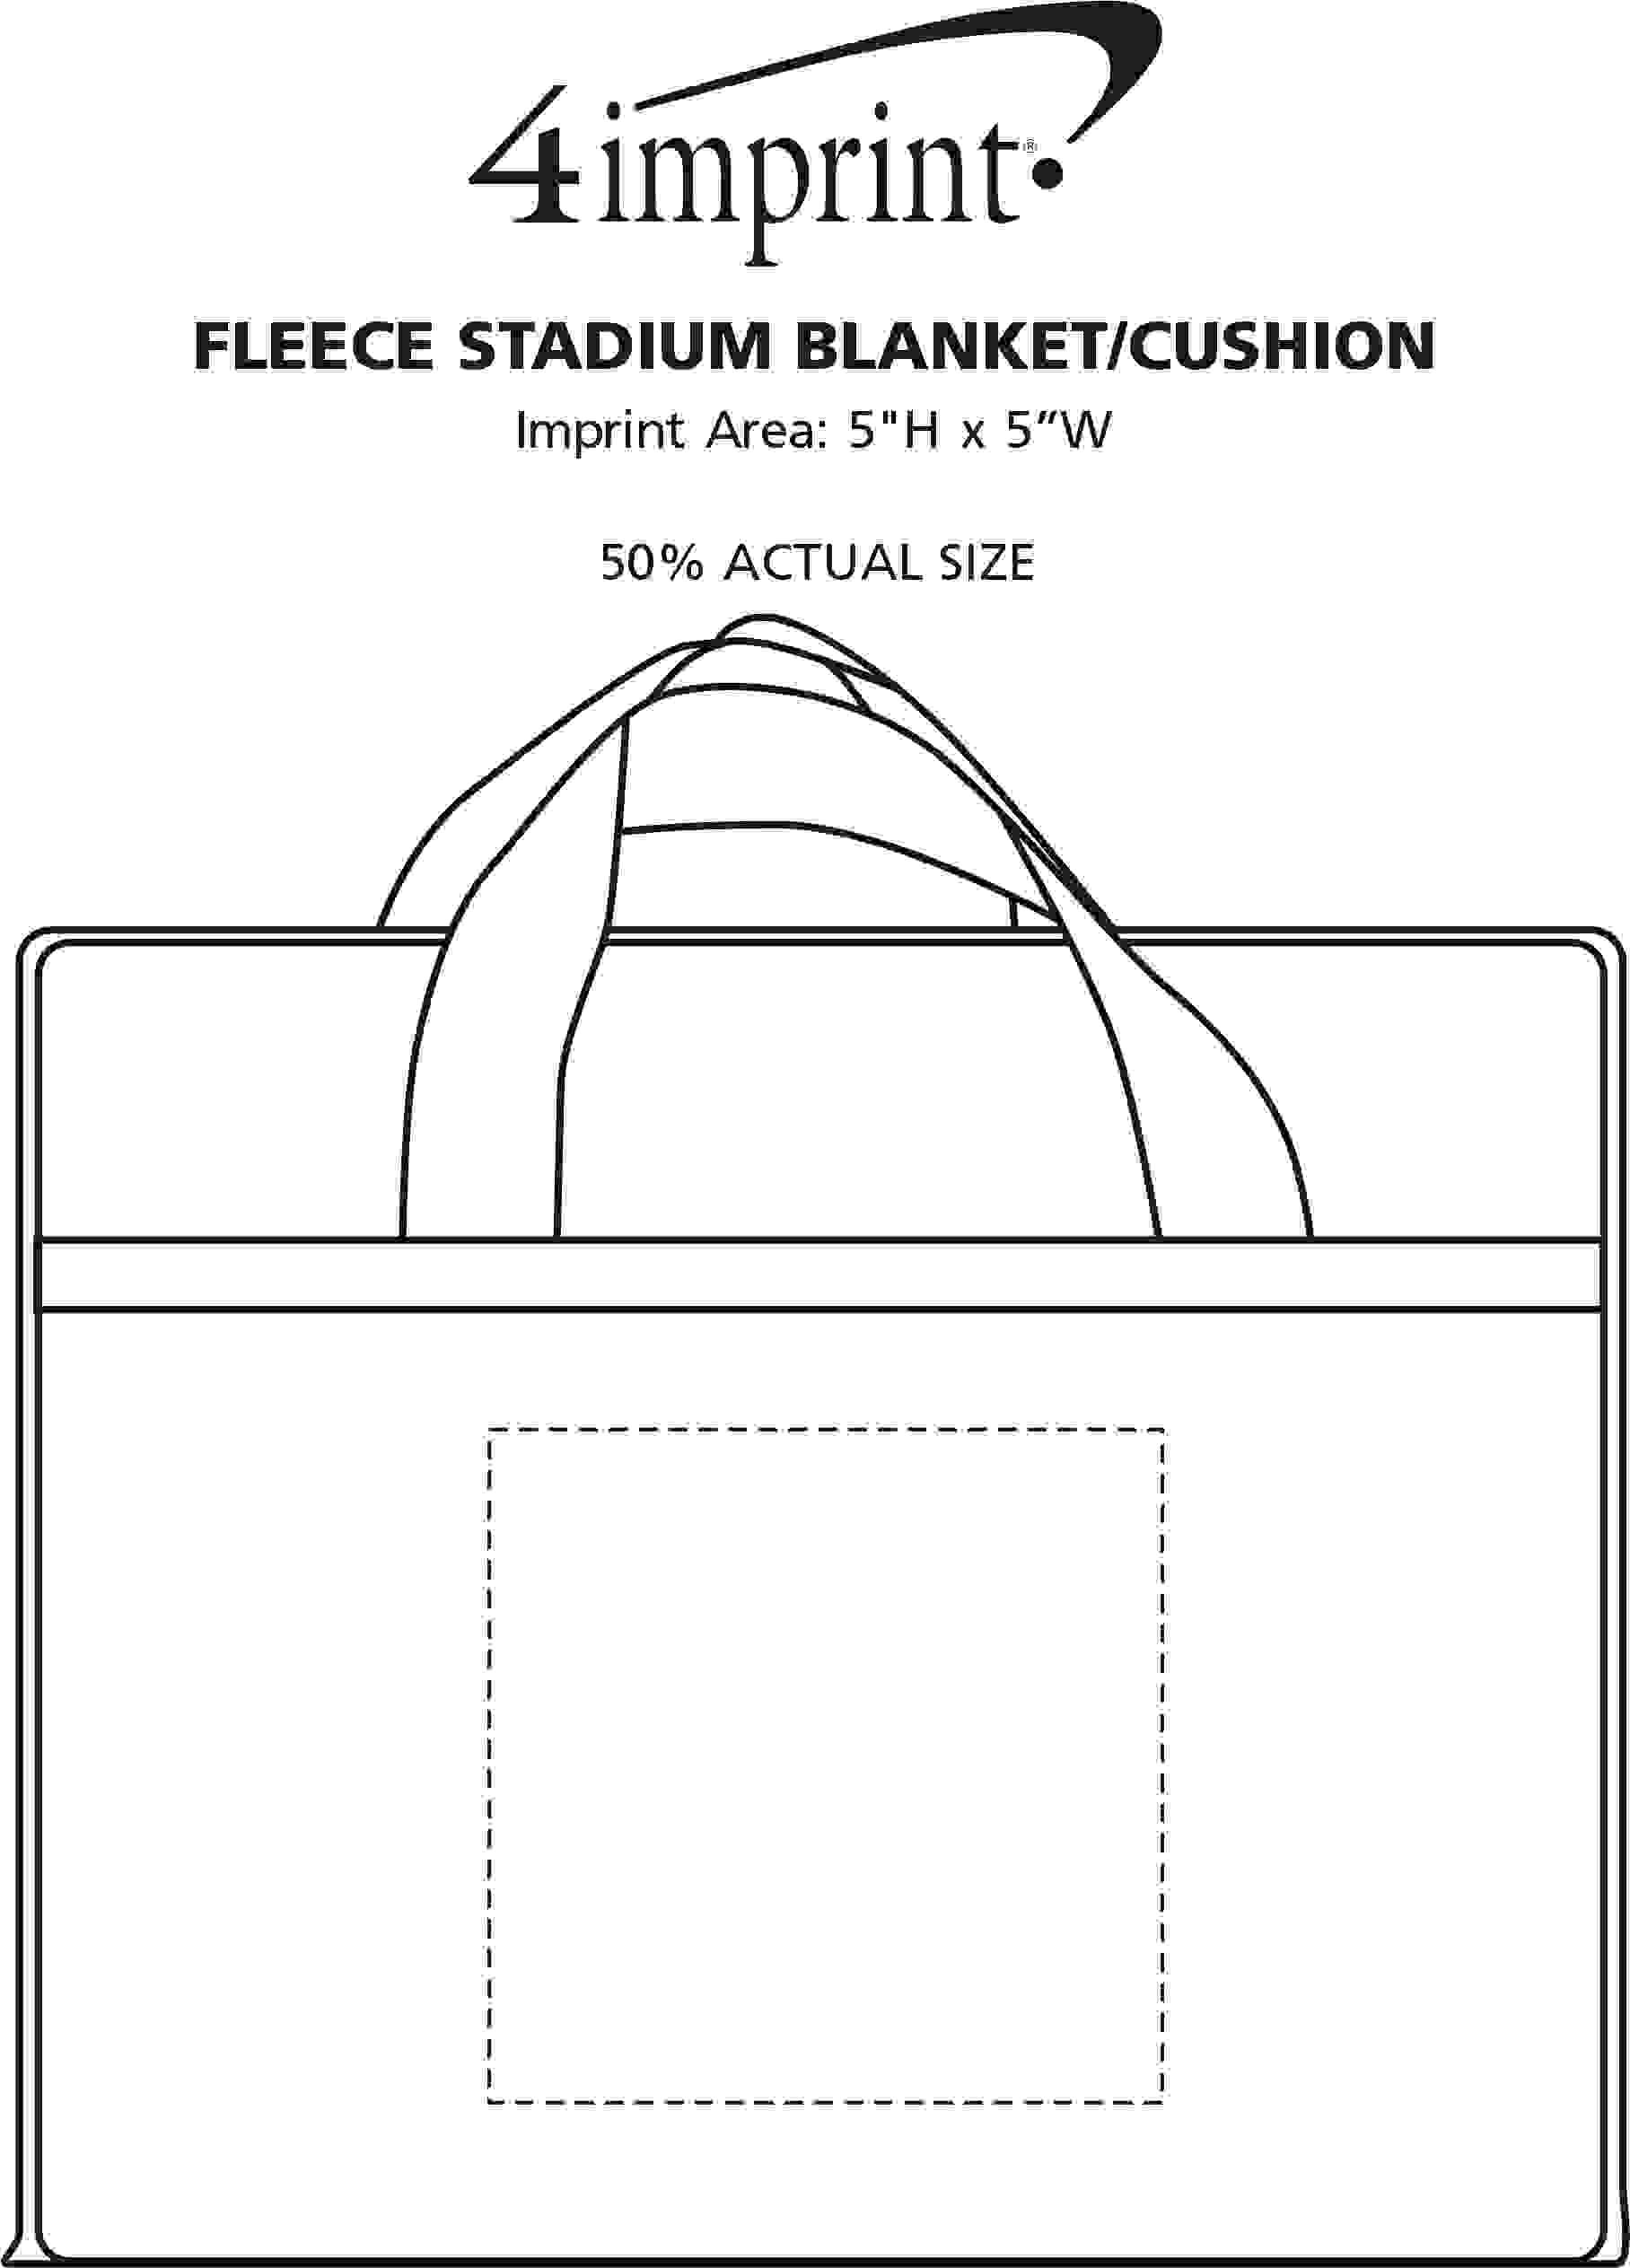 Imprint Area of Fleece Stadium Blanket/Cushion